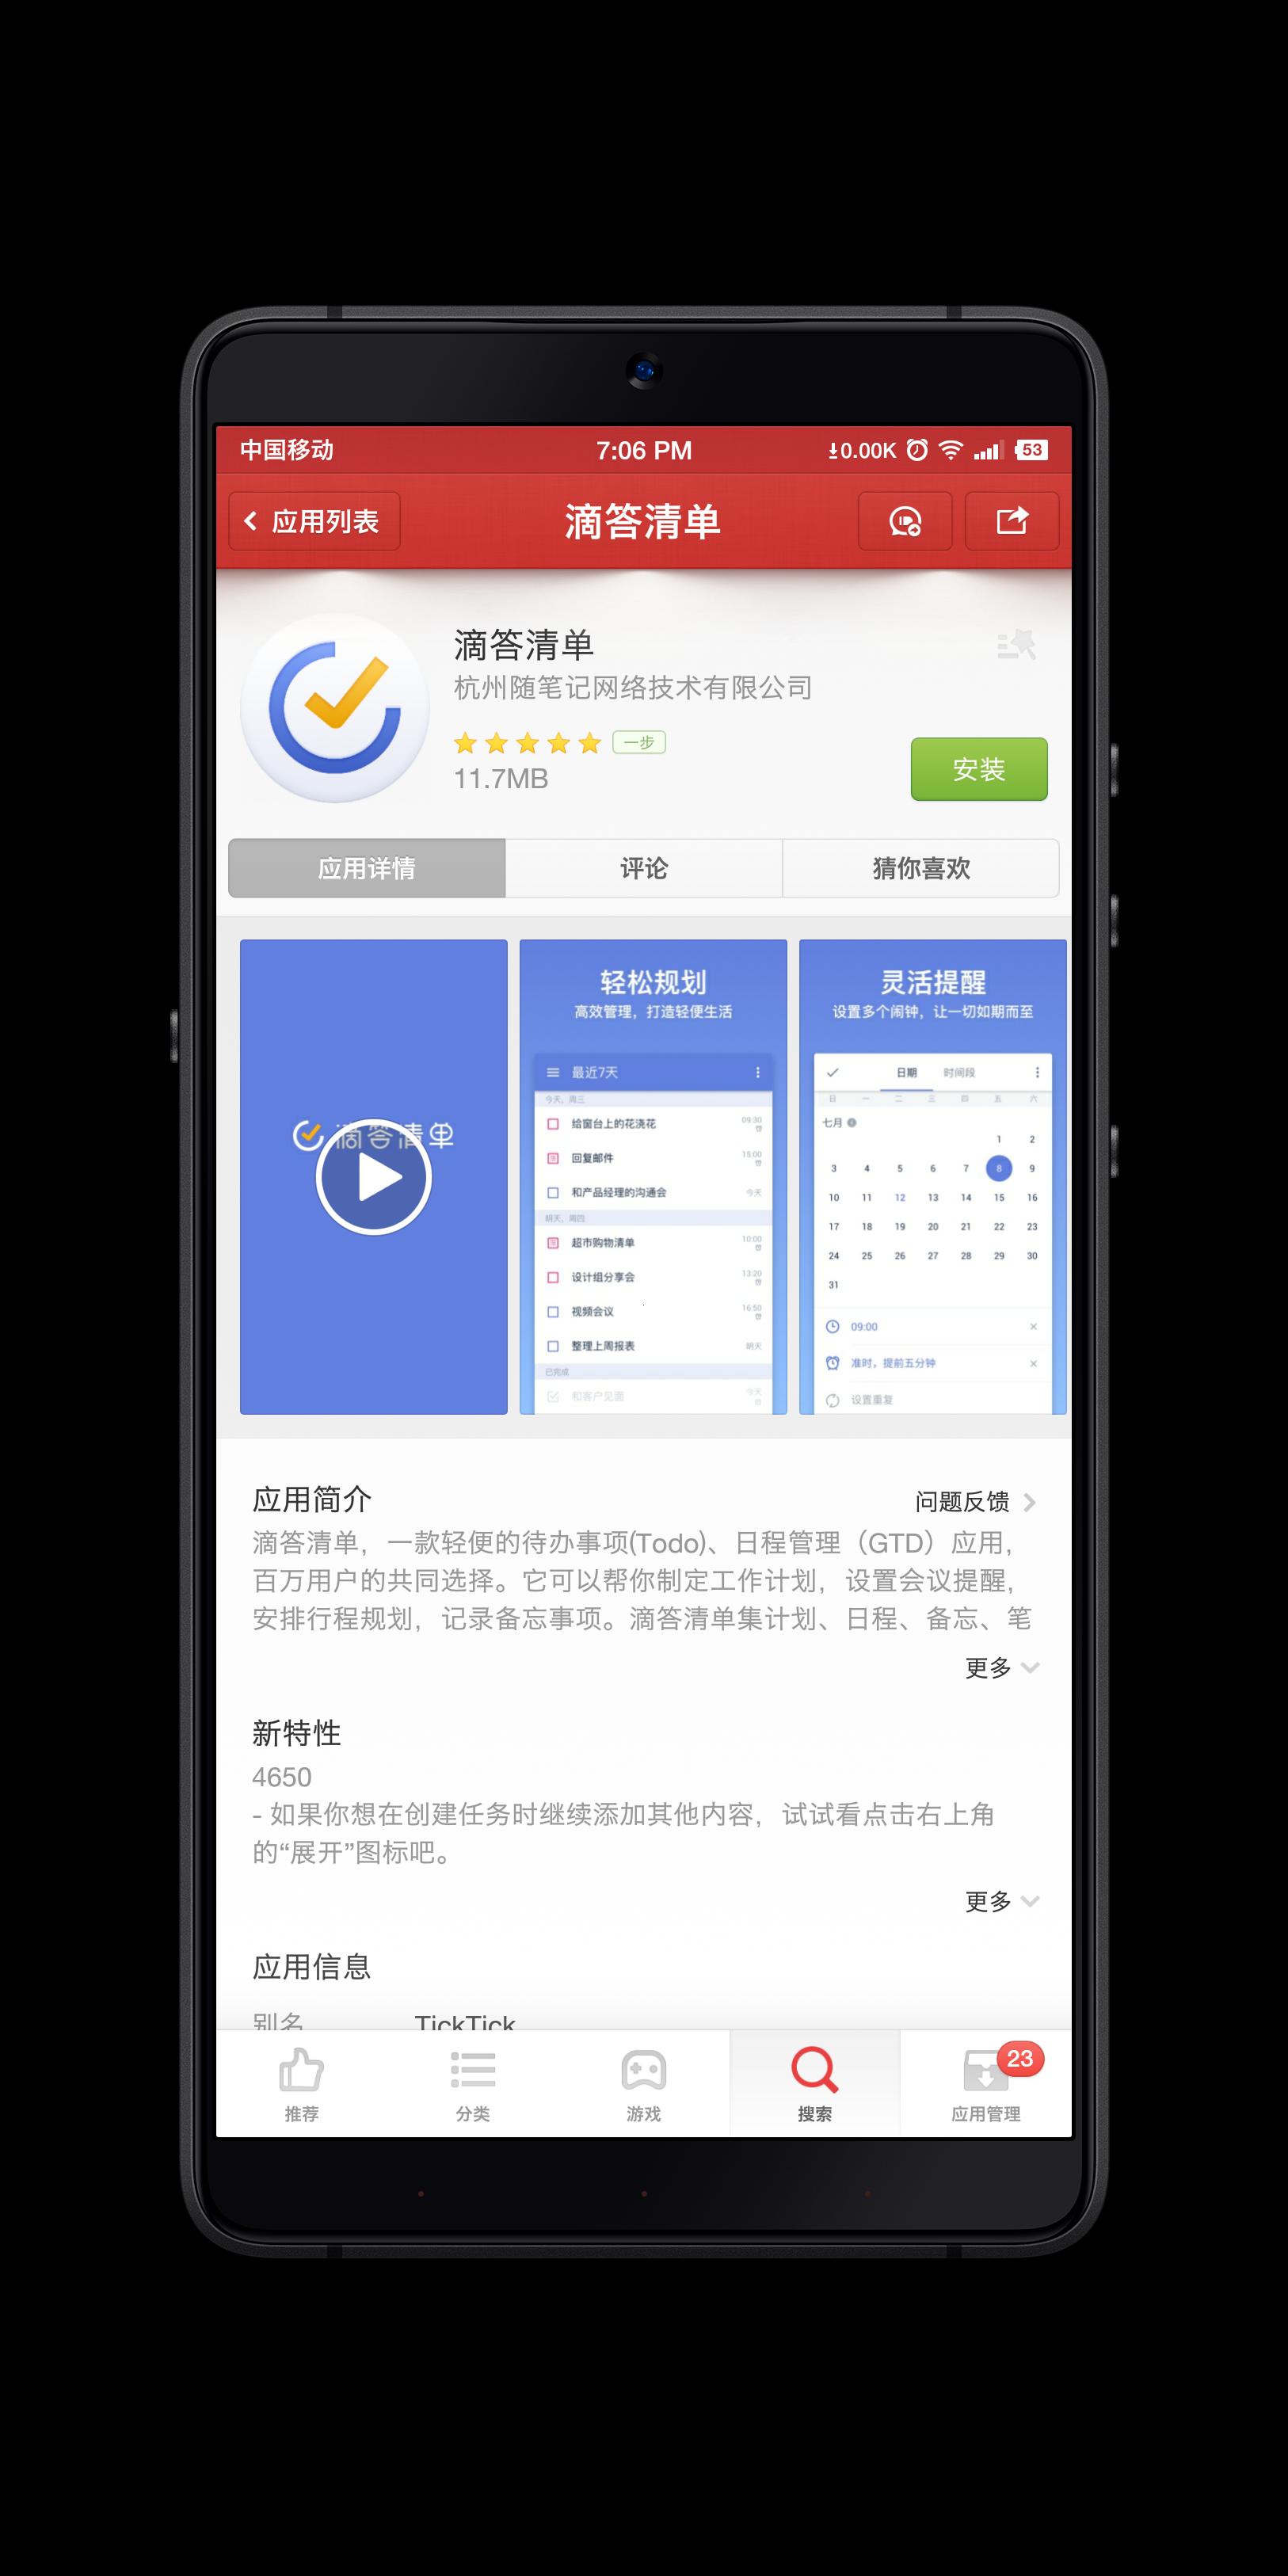 Screenshot_2018-10-07-19-06-40-140_应用商店.png